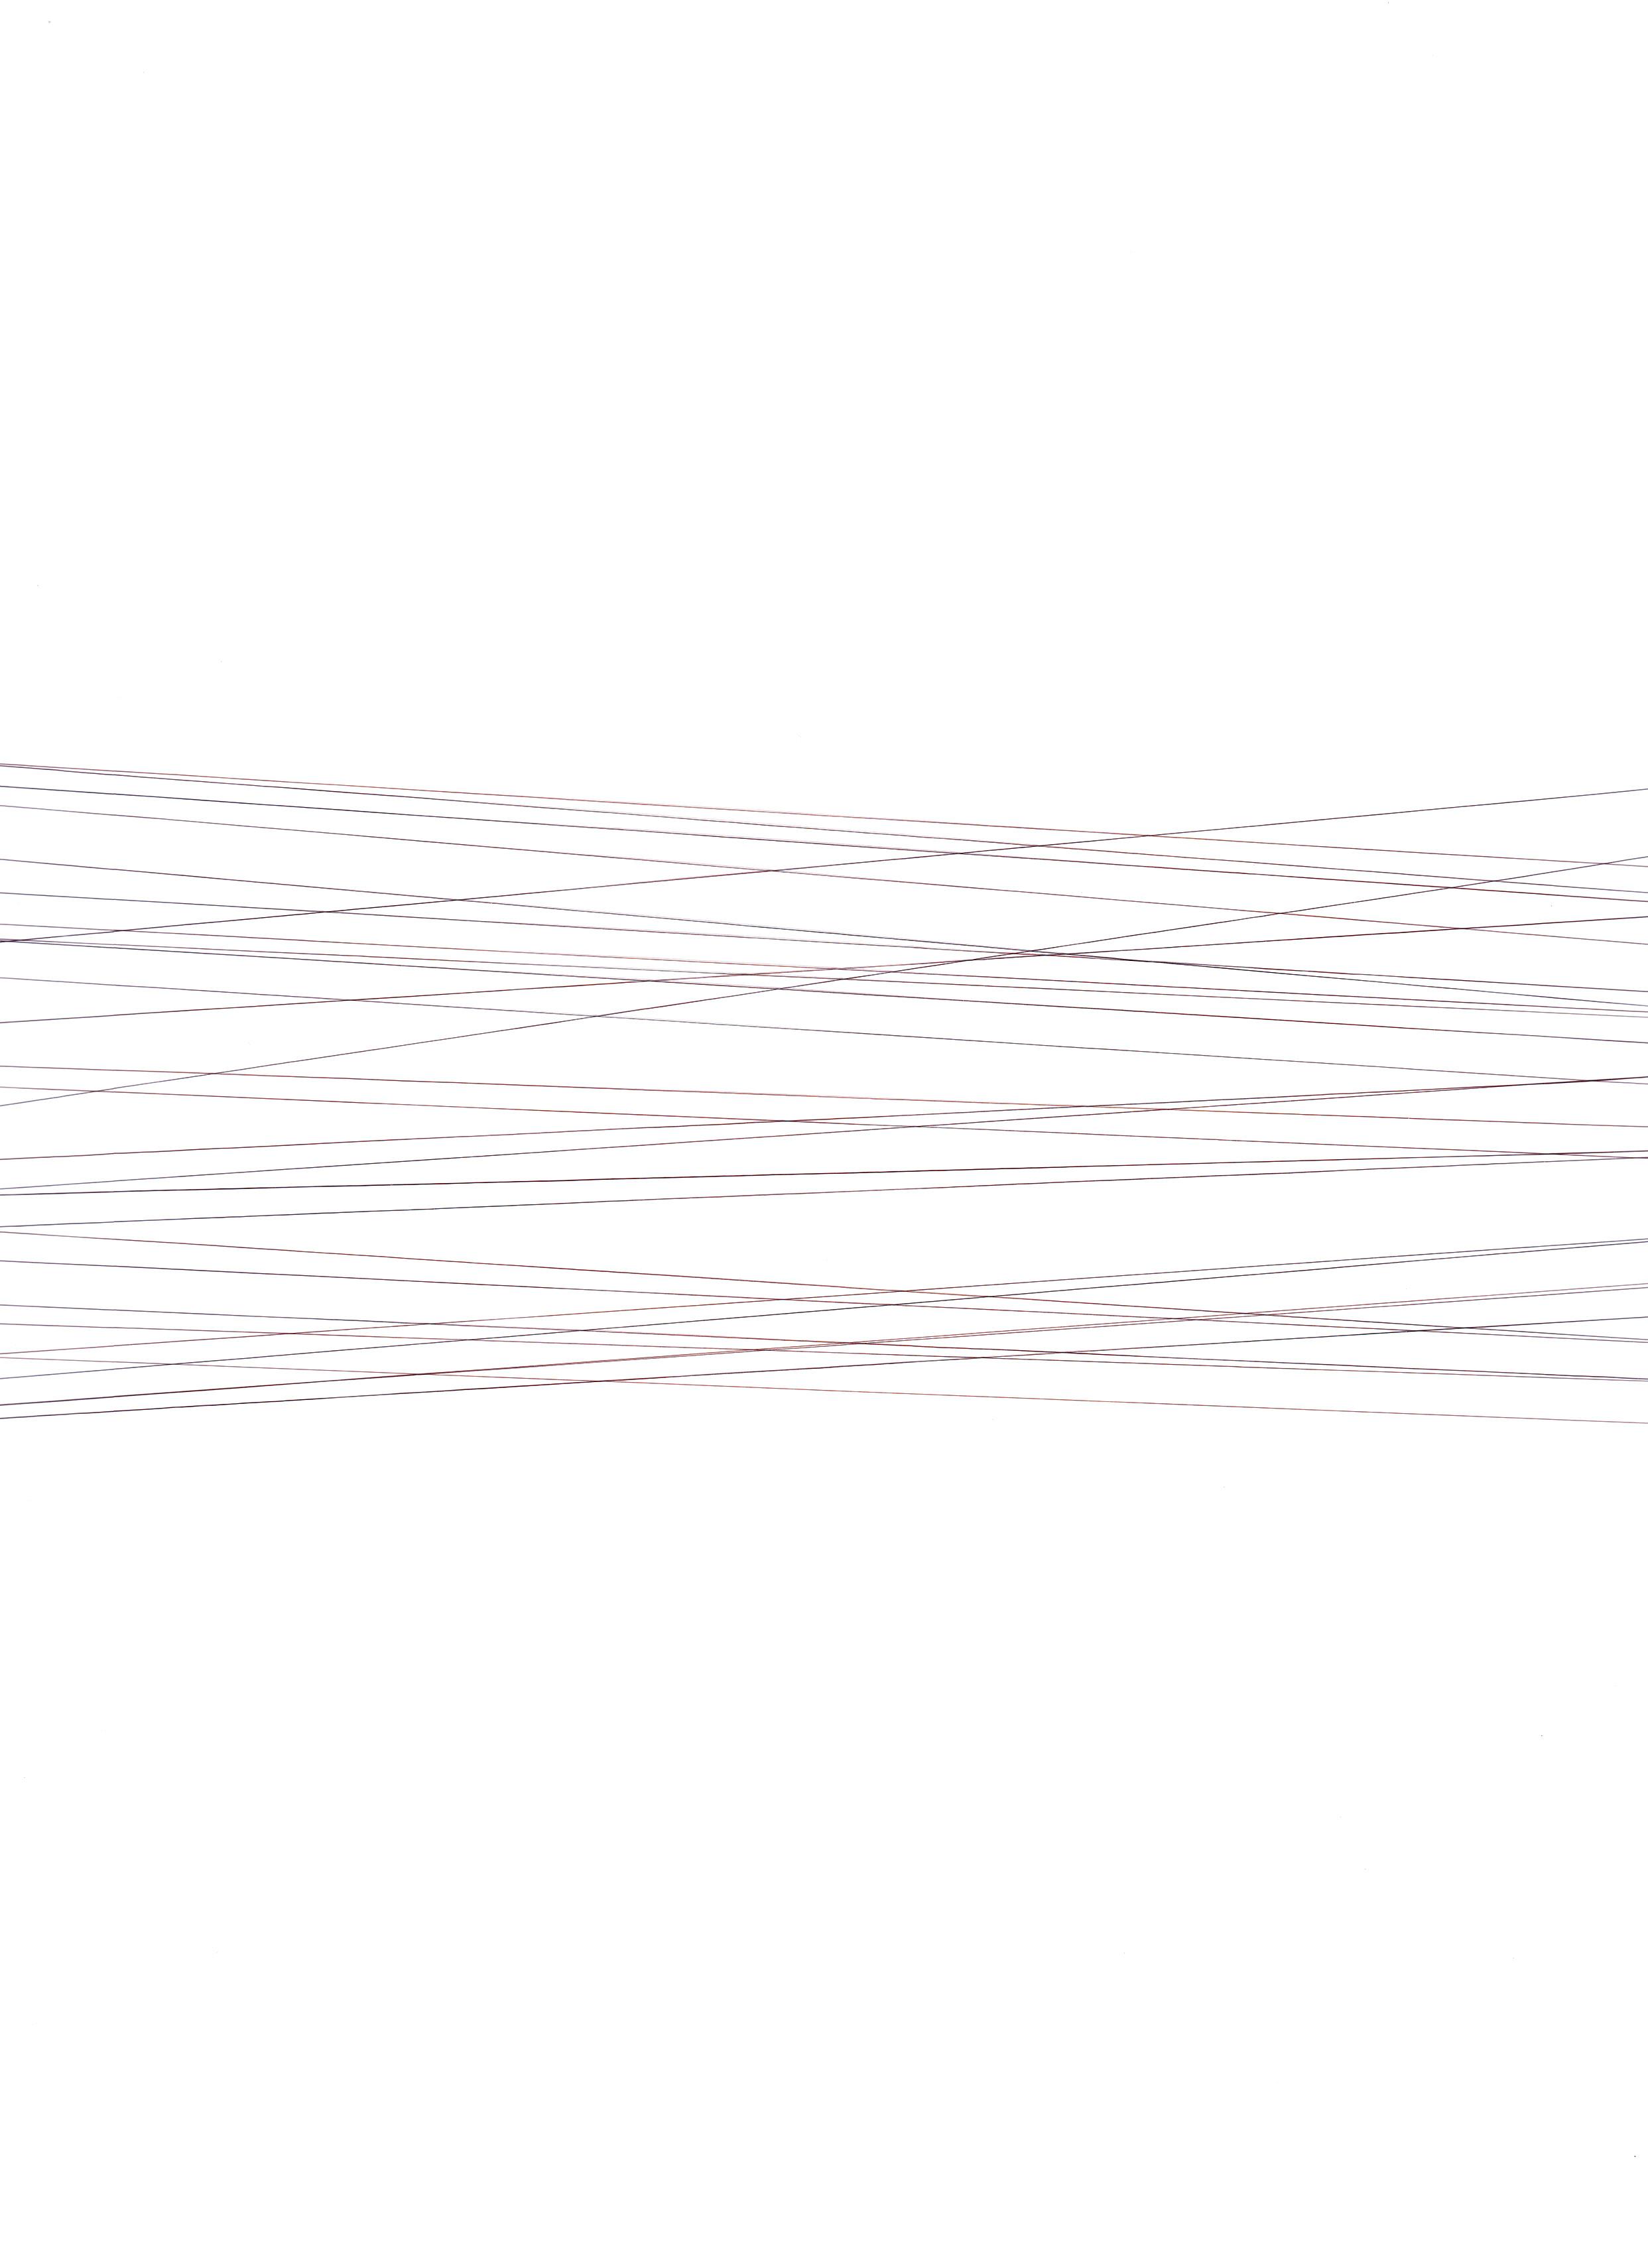 Geometria_corporal_9_Janet_Toro_2013